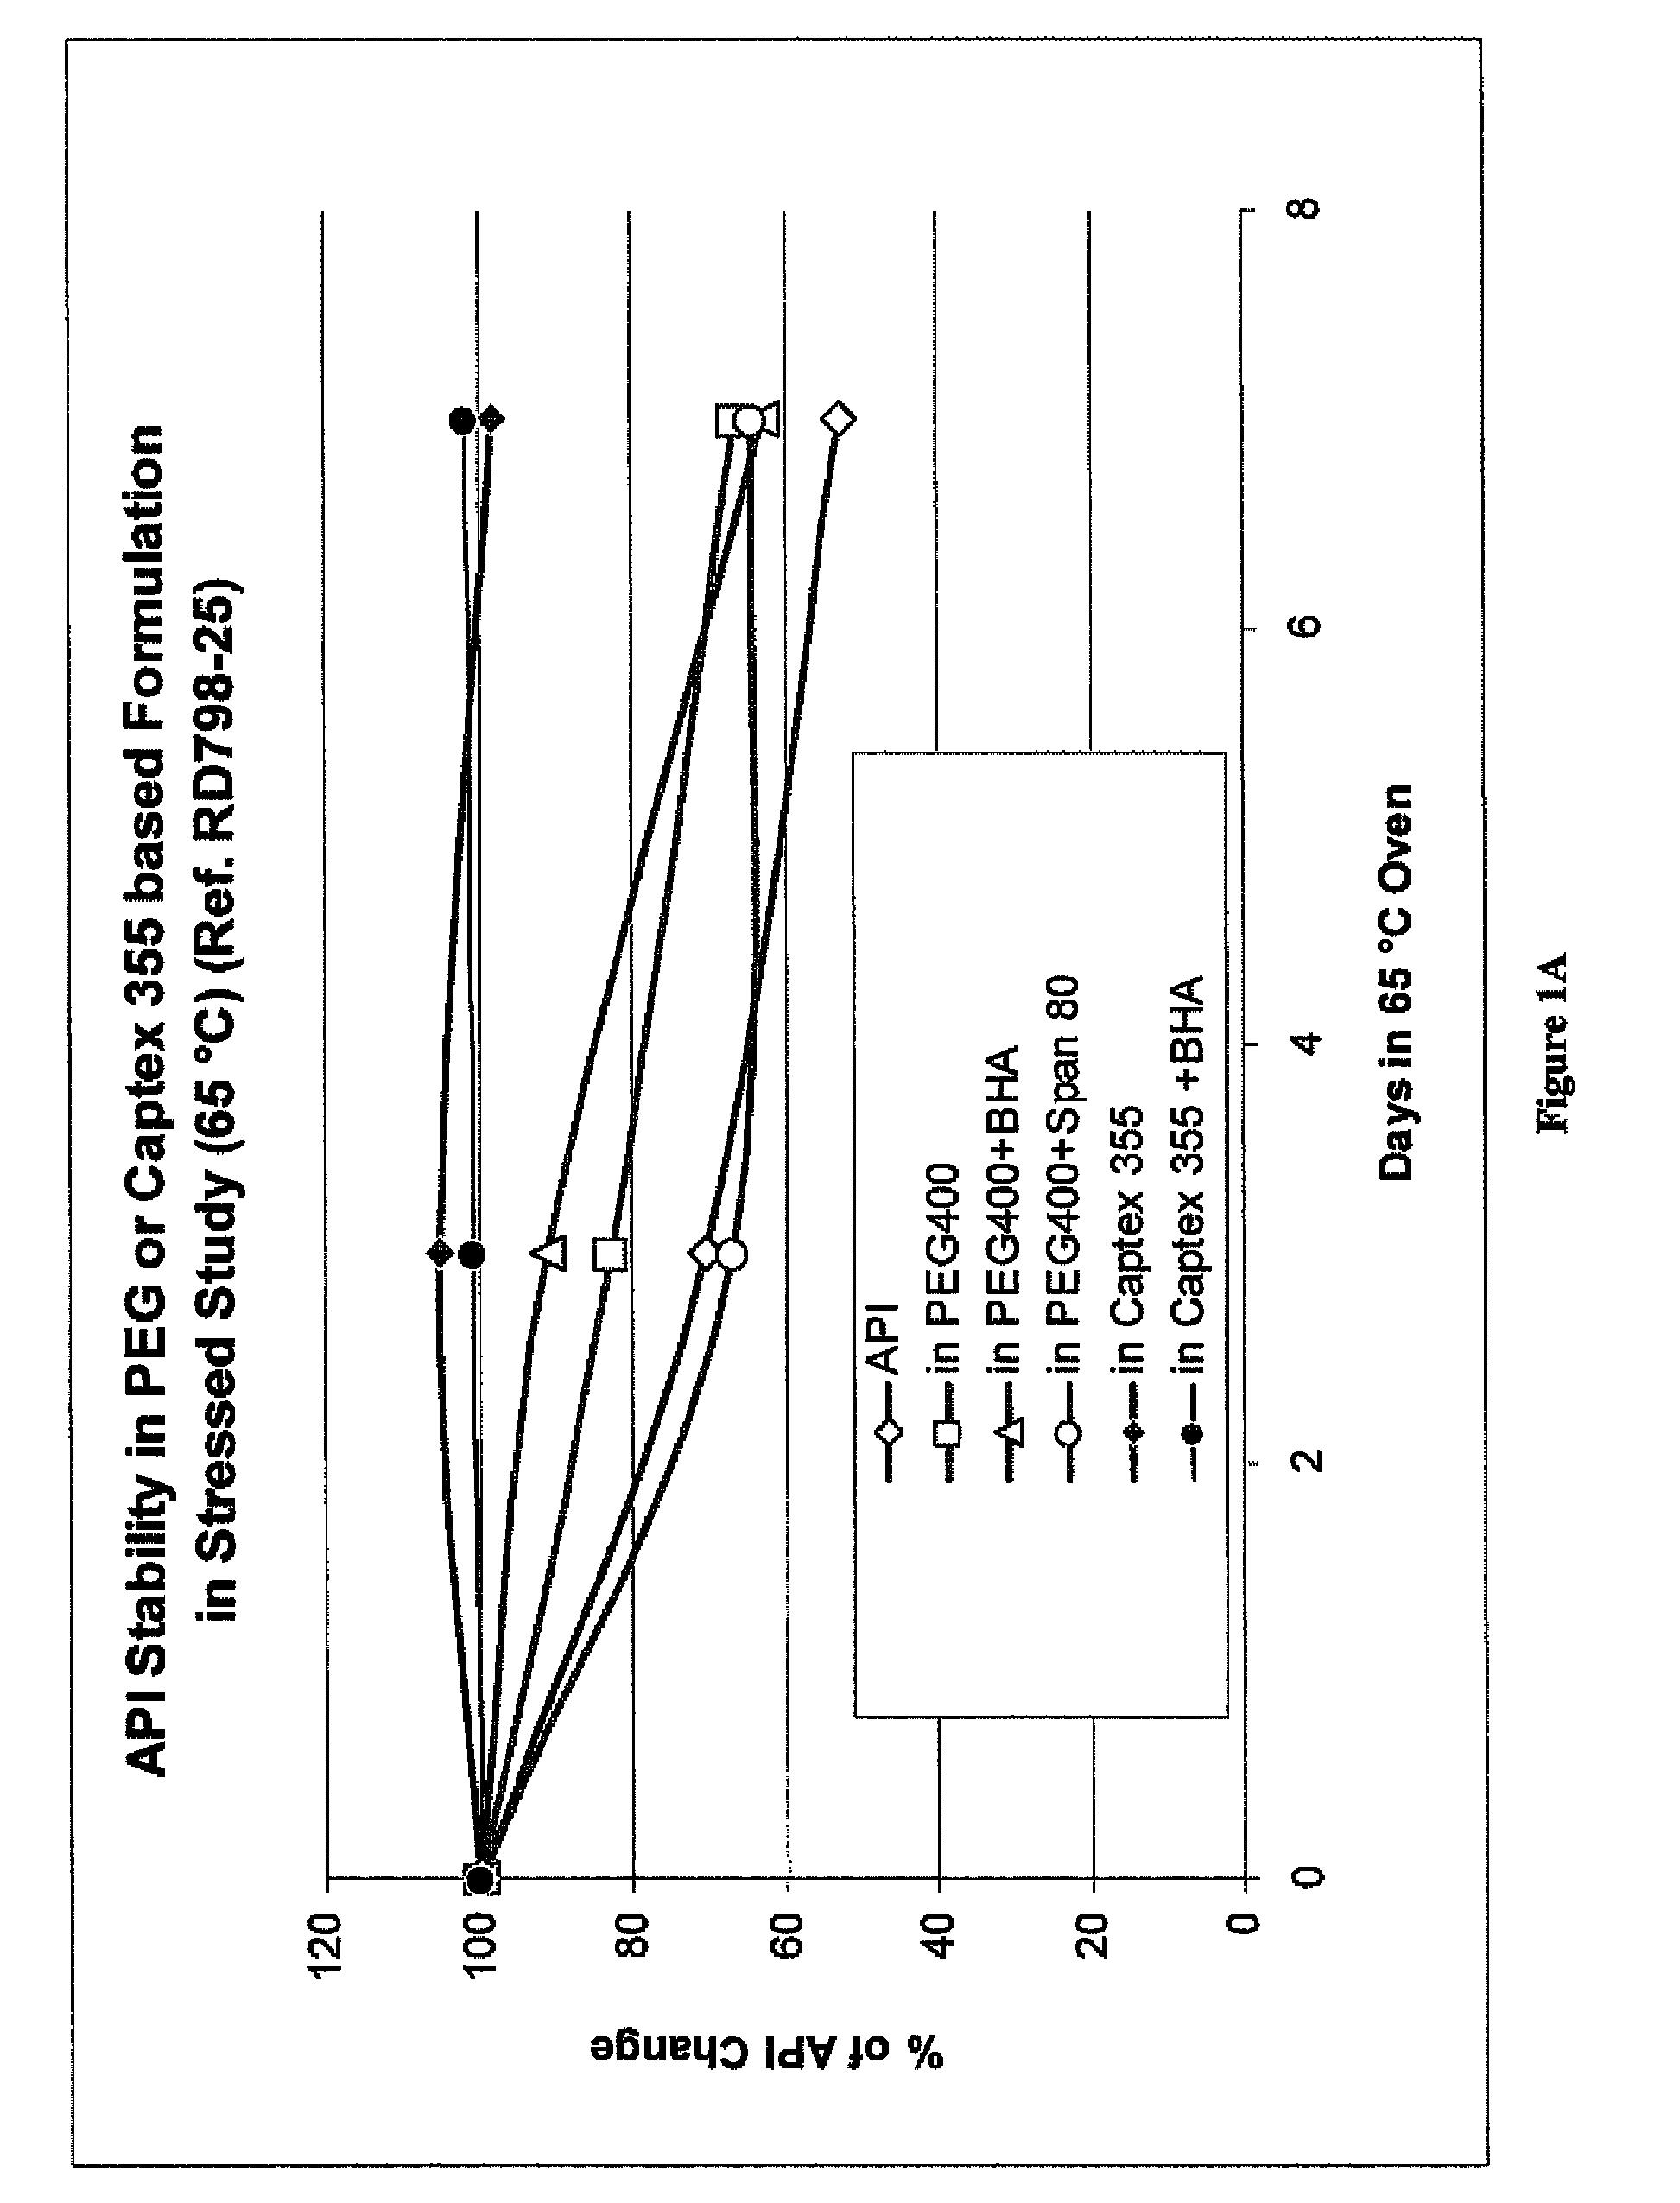 sildenafil distributor in kerala